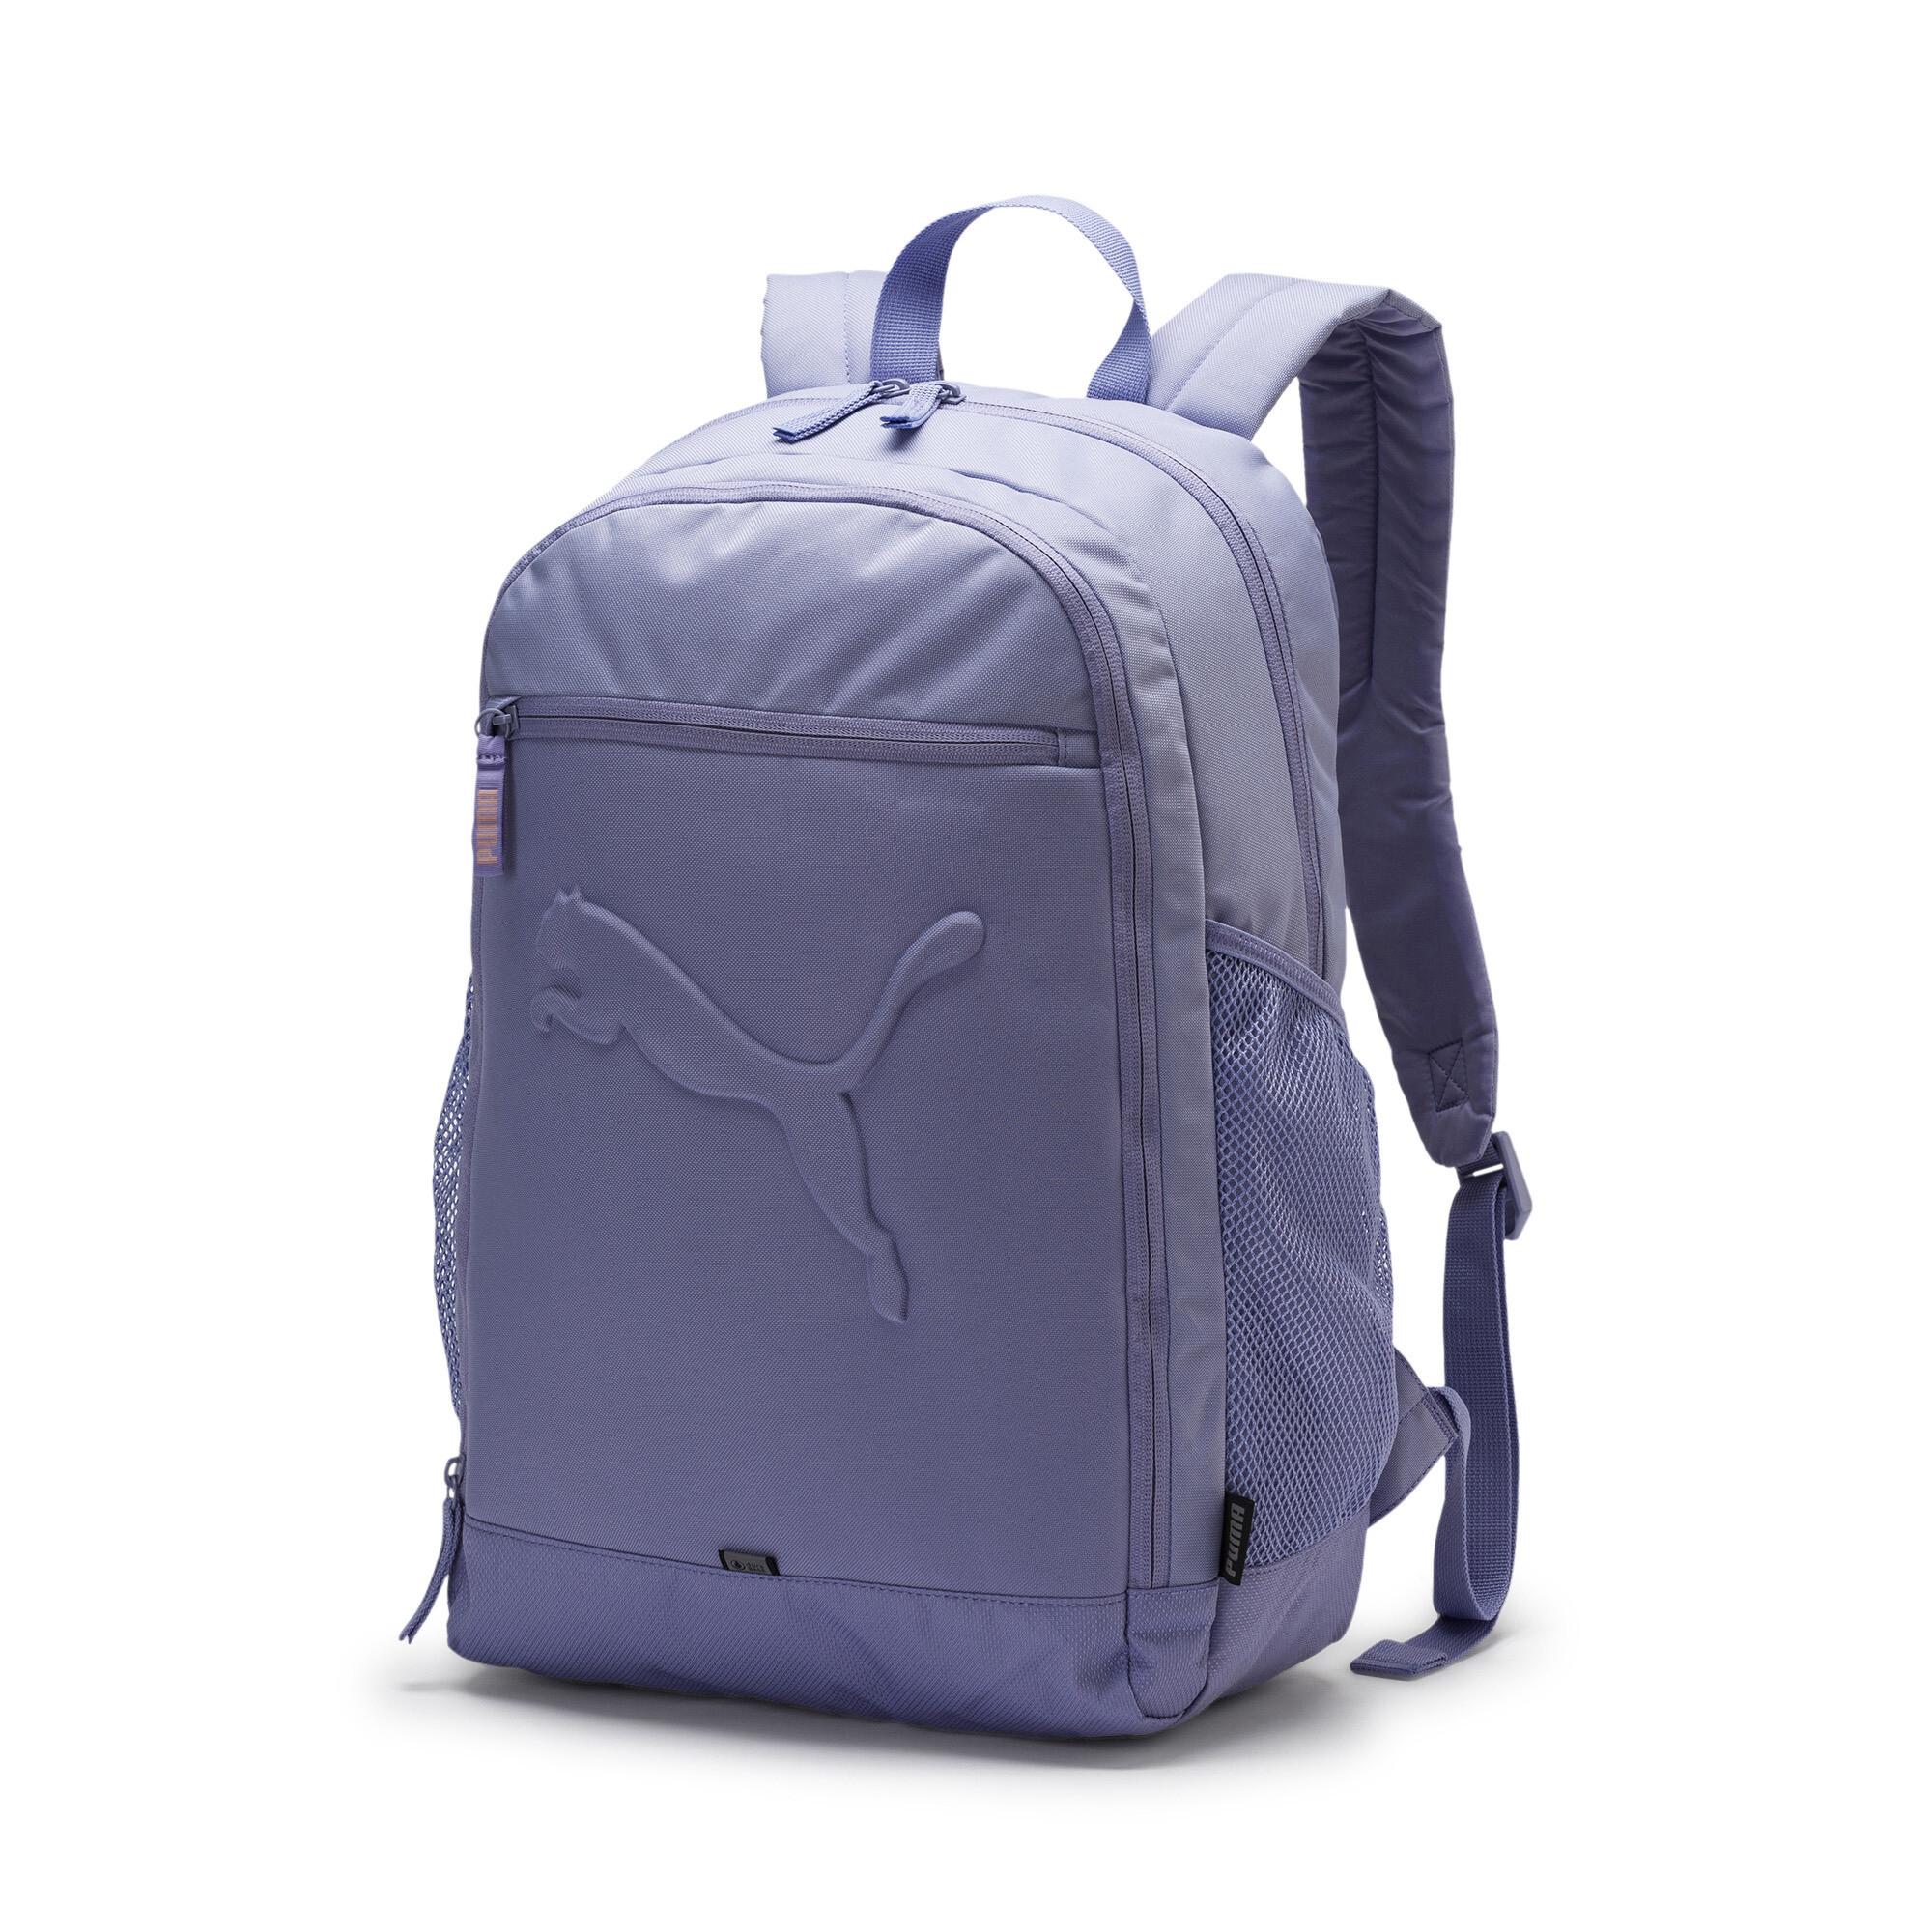 e691b46228273 Backpacks   Bags - Accessories - Mens